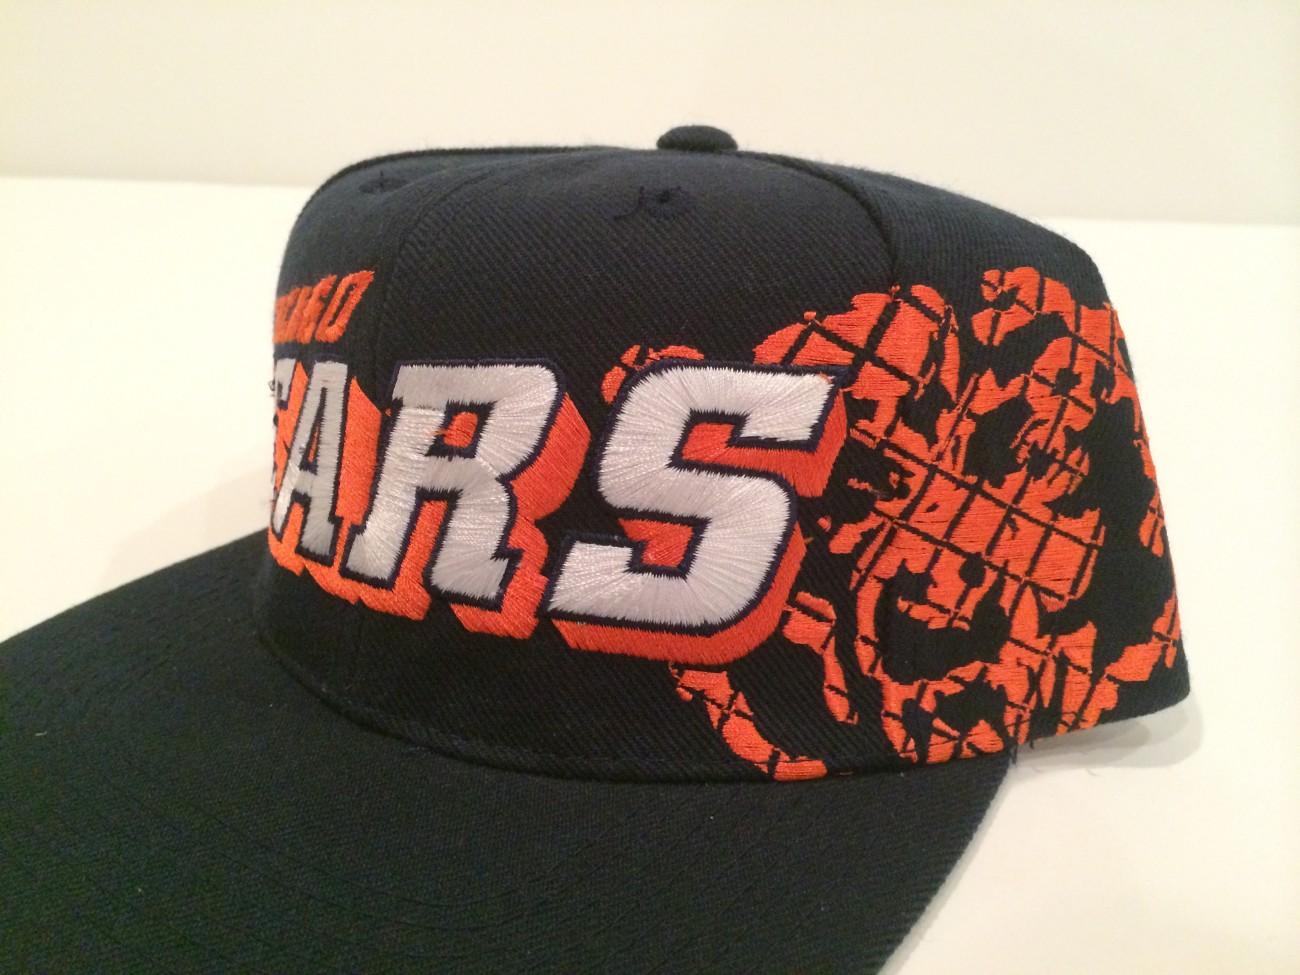 Vintage Chicago Bears Sports Specialties NFL Snapback Hat  9cc8b3ab6